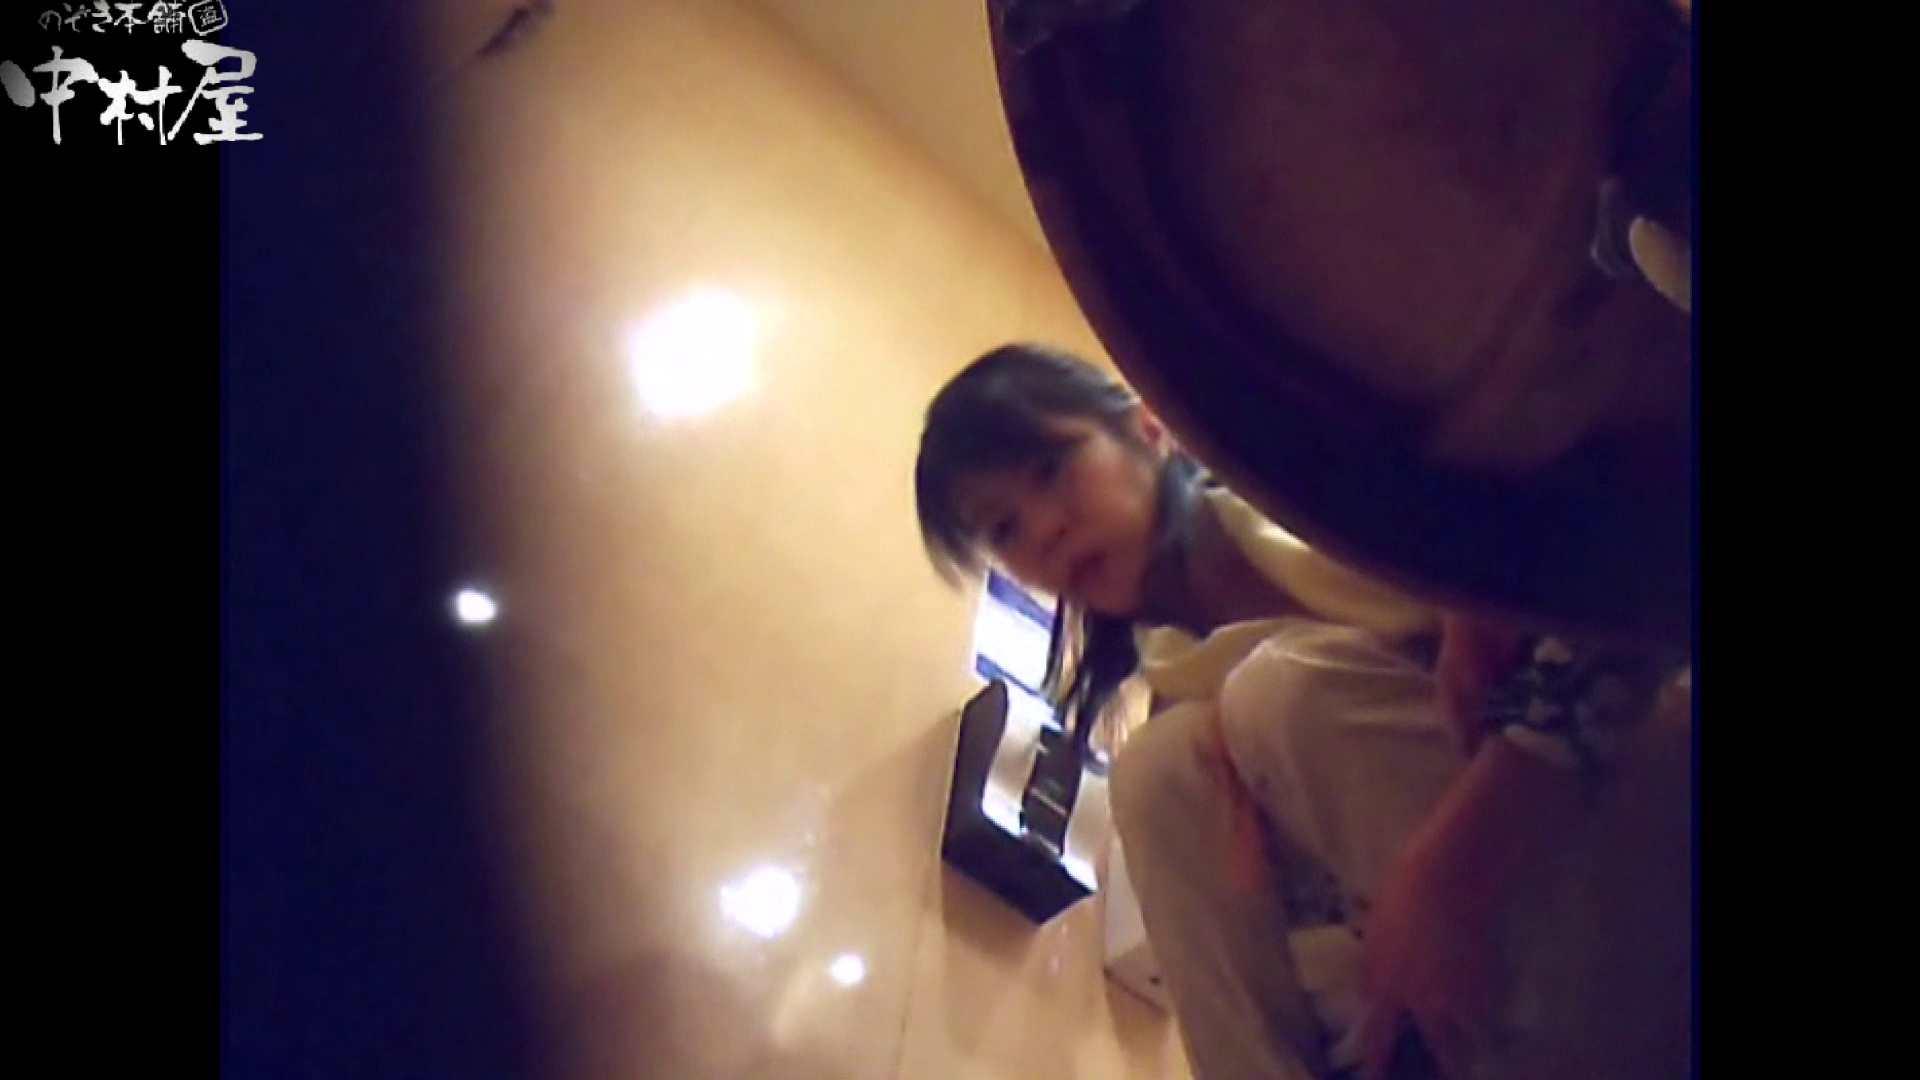 突撃!女子化粧室の真実vol.33前編 盗撮 | 丸見え  82PICs 26